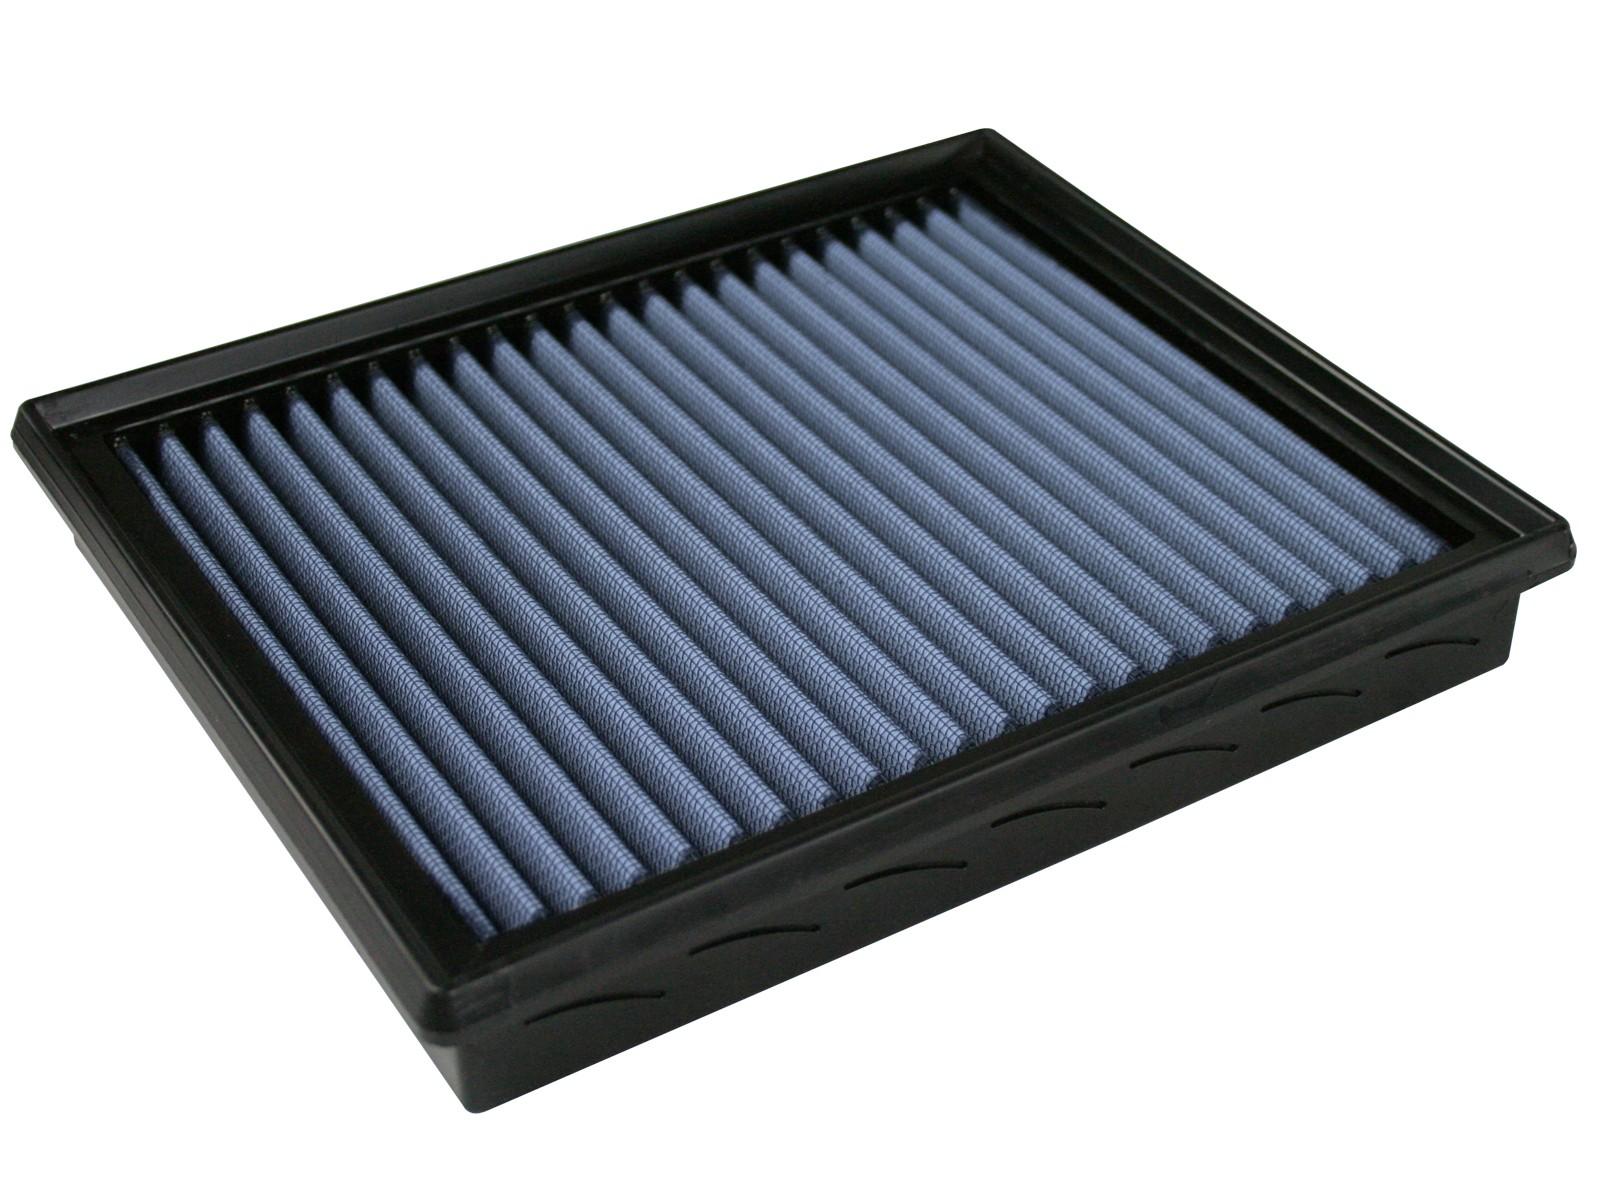 aFe POWER 30-10044 Magnum FLOW Pro 5R Air Filter